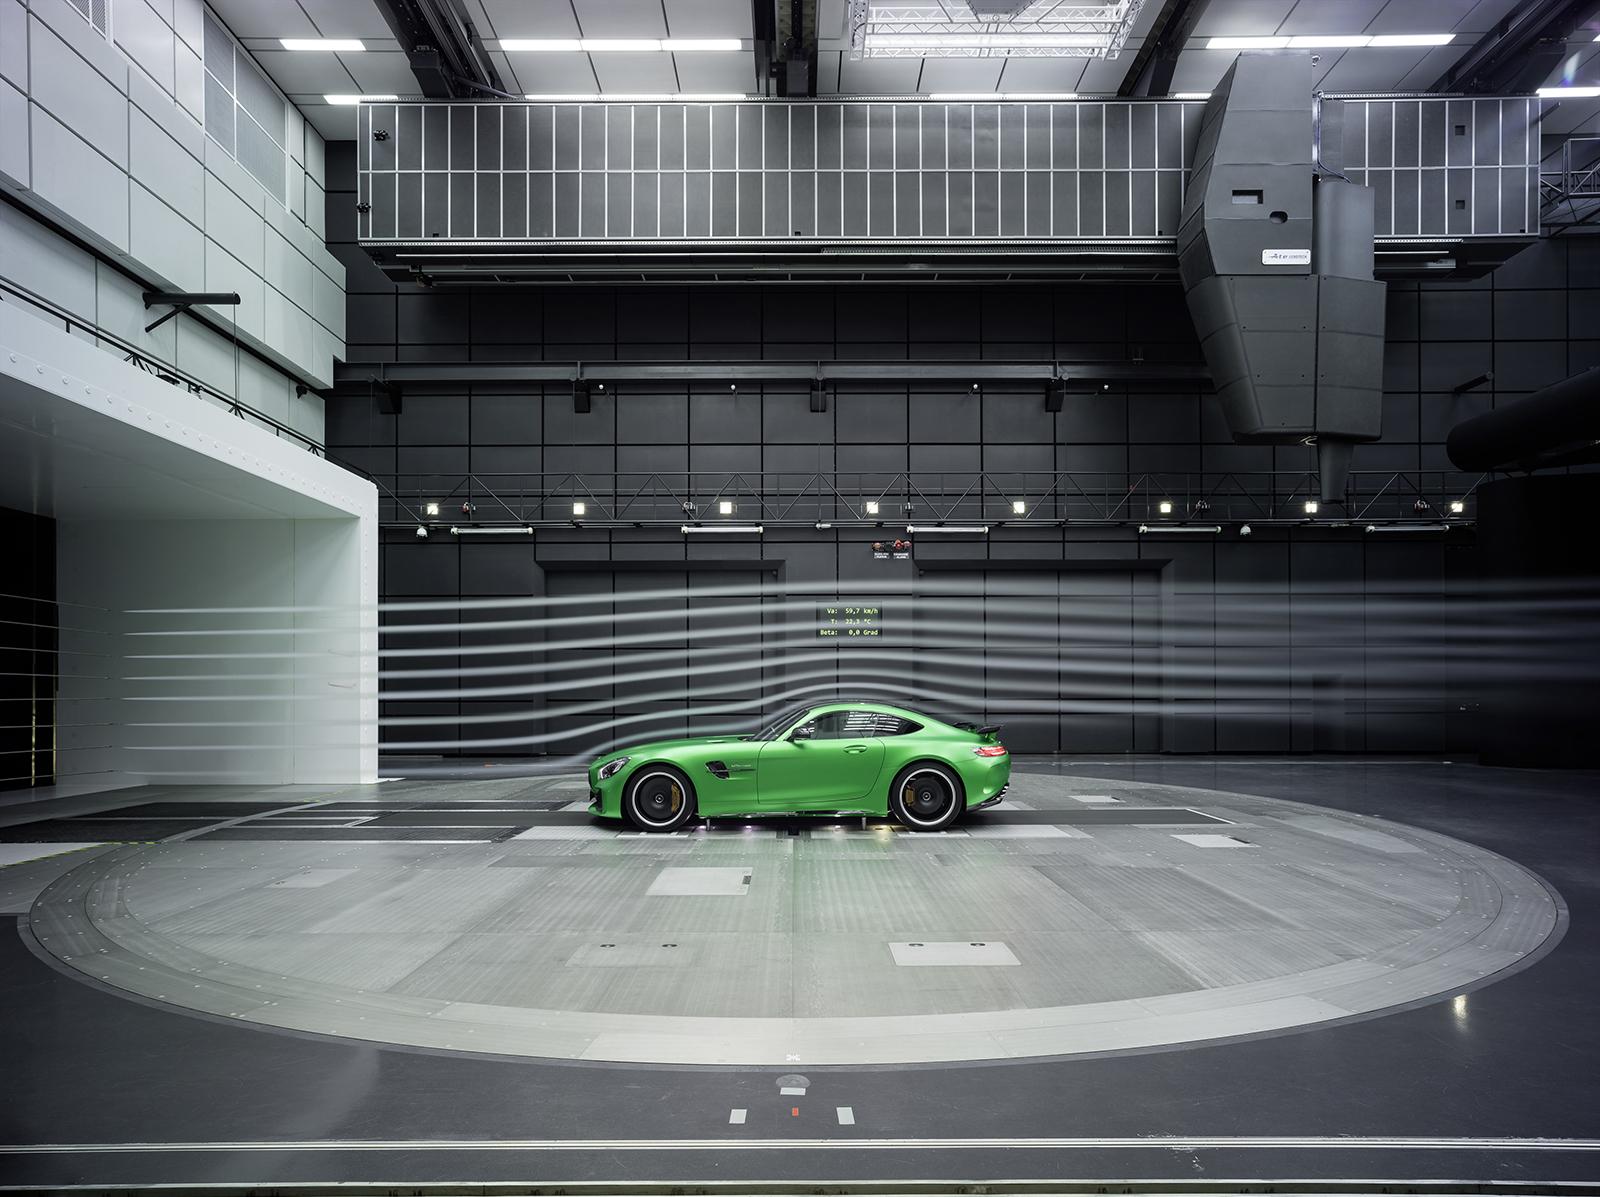 Mercedes AMG GT R New Wallpaper